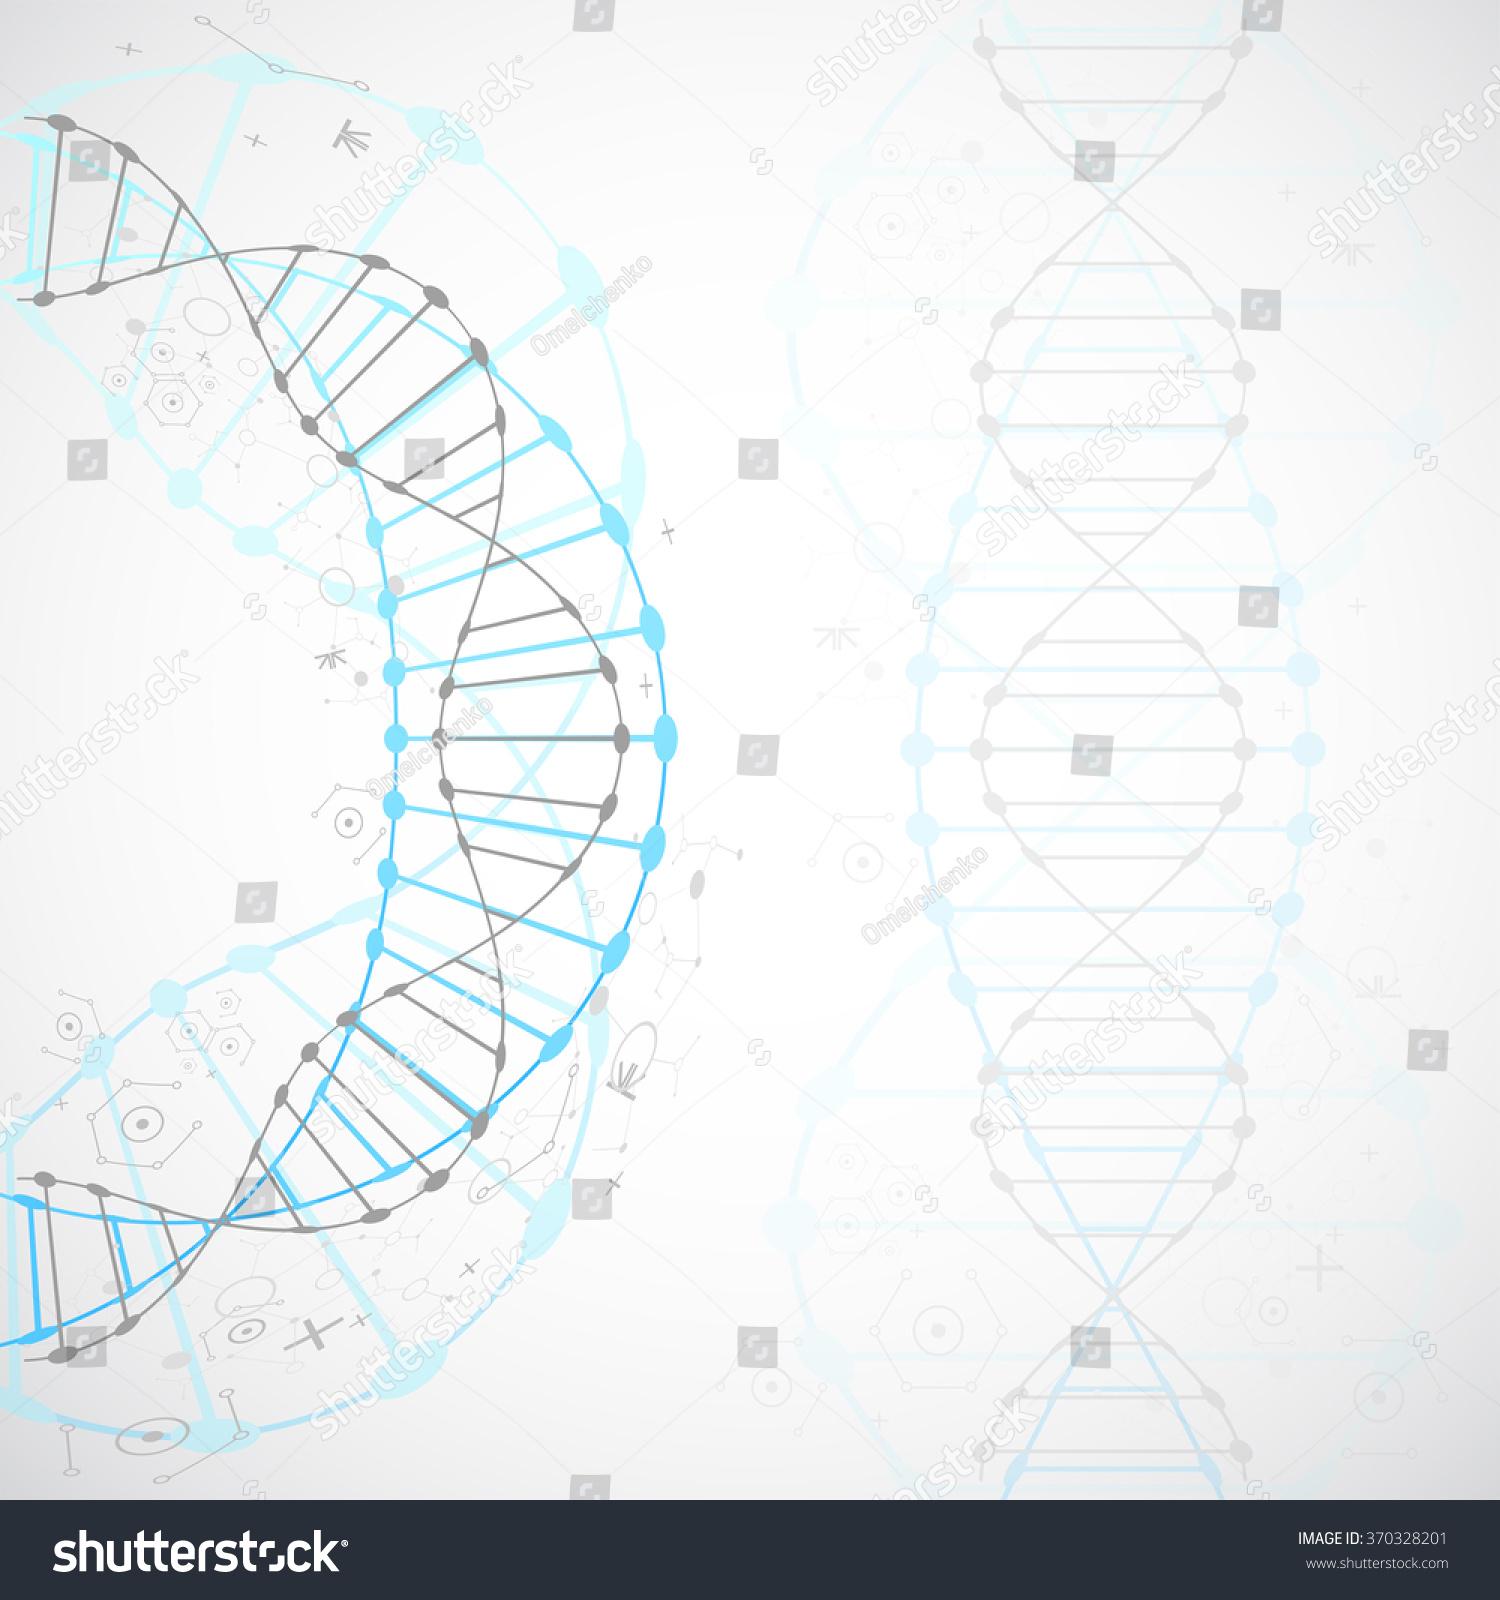 Dna Model Wallpaper: Science Template Wallpaper Banner Dna Molecules Stock